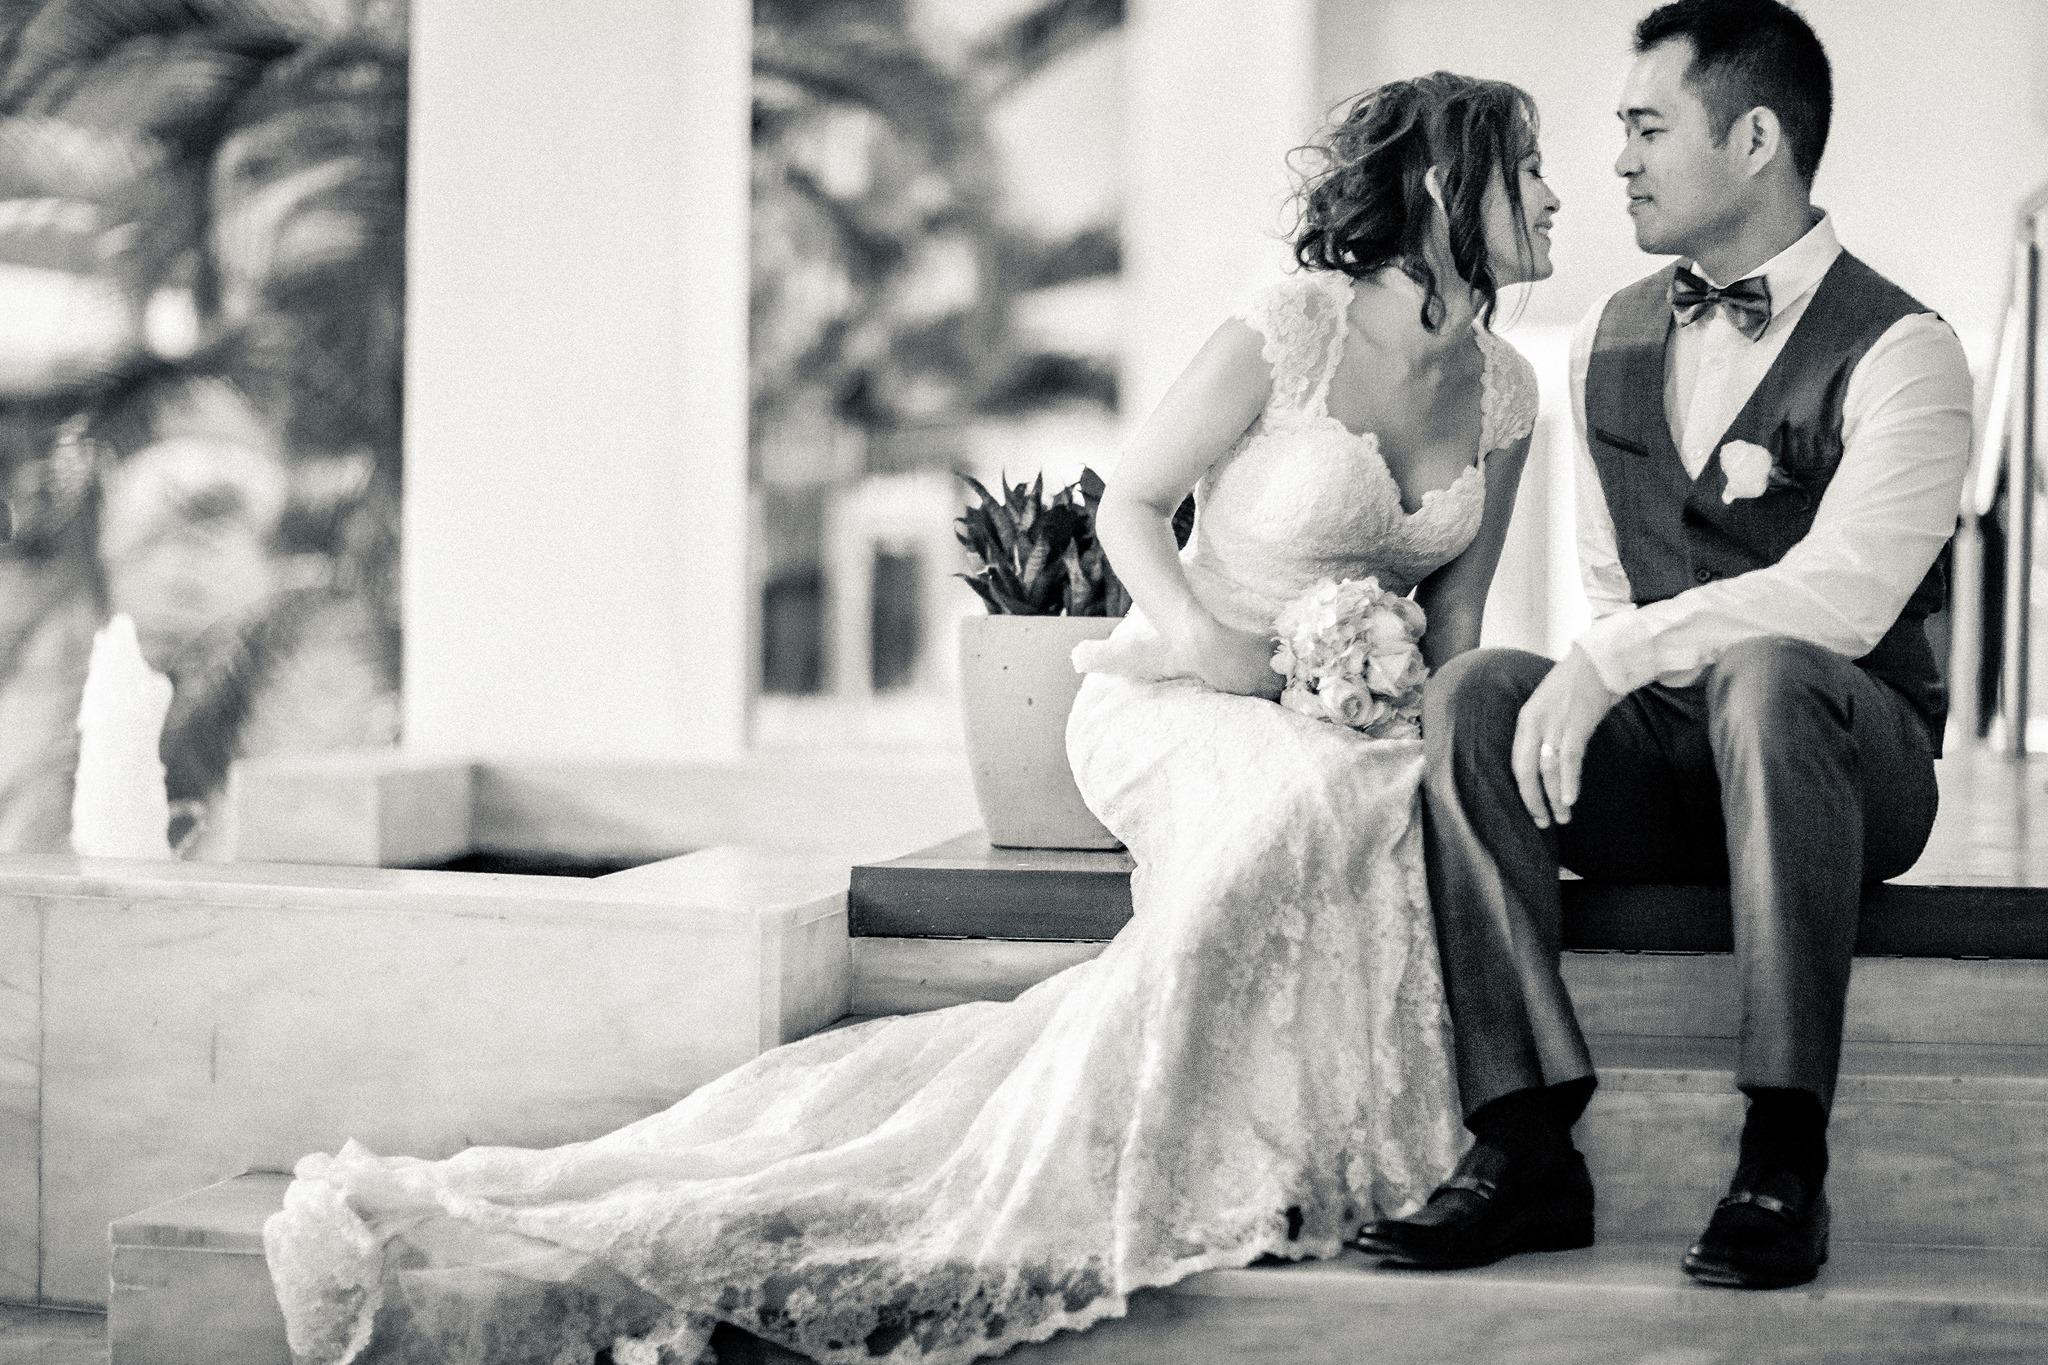 DCFF FS WEBSITE PHOTOGRAPHY WEDDINGS BANNER 1924700_10100793109239766_494452910_o.jpg